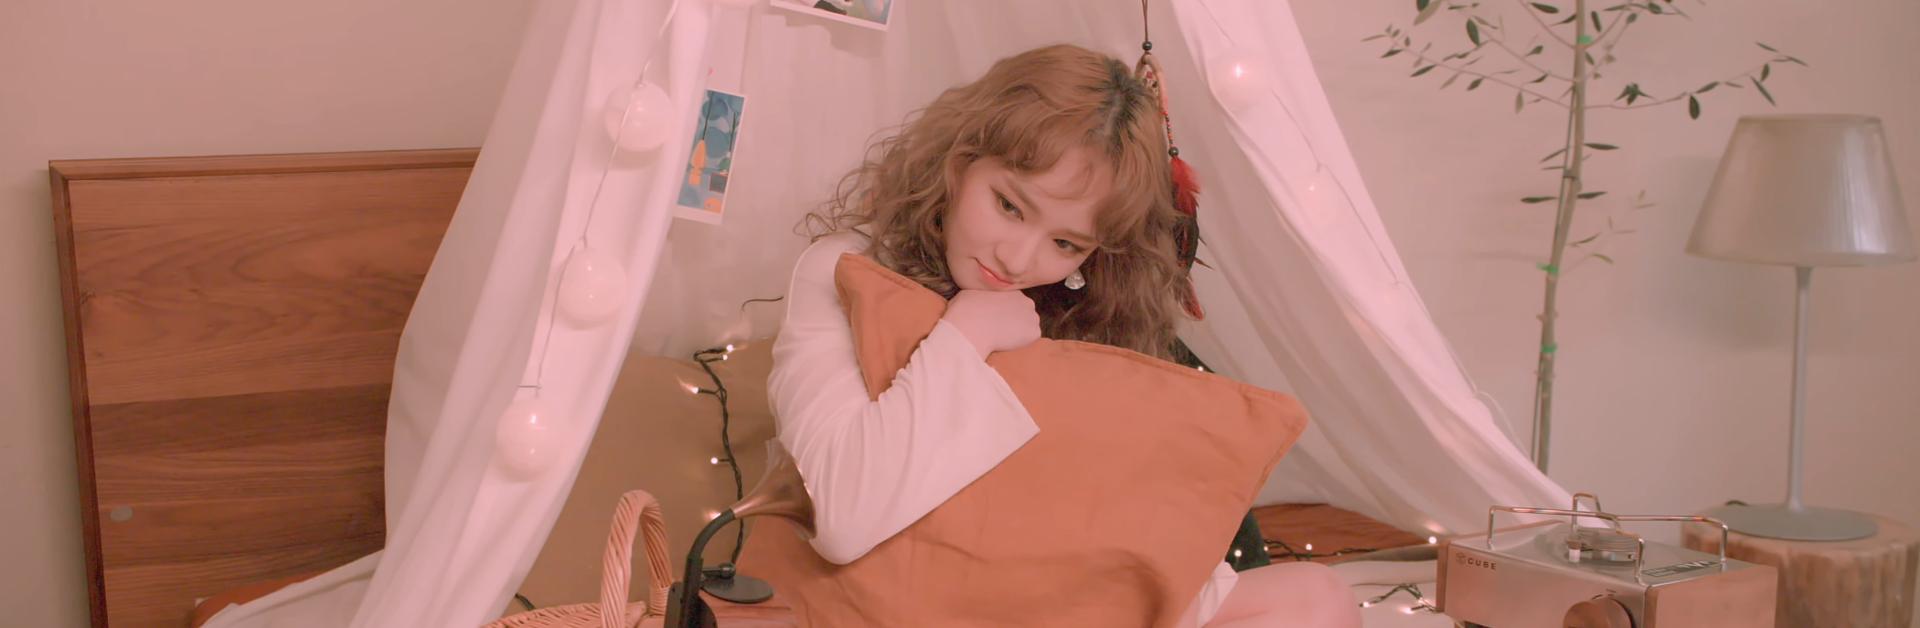 "SoJung ""Island"" MV"